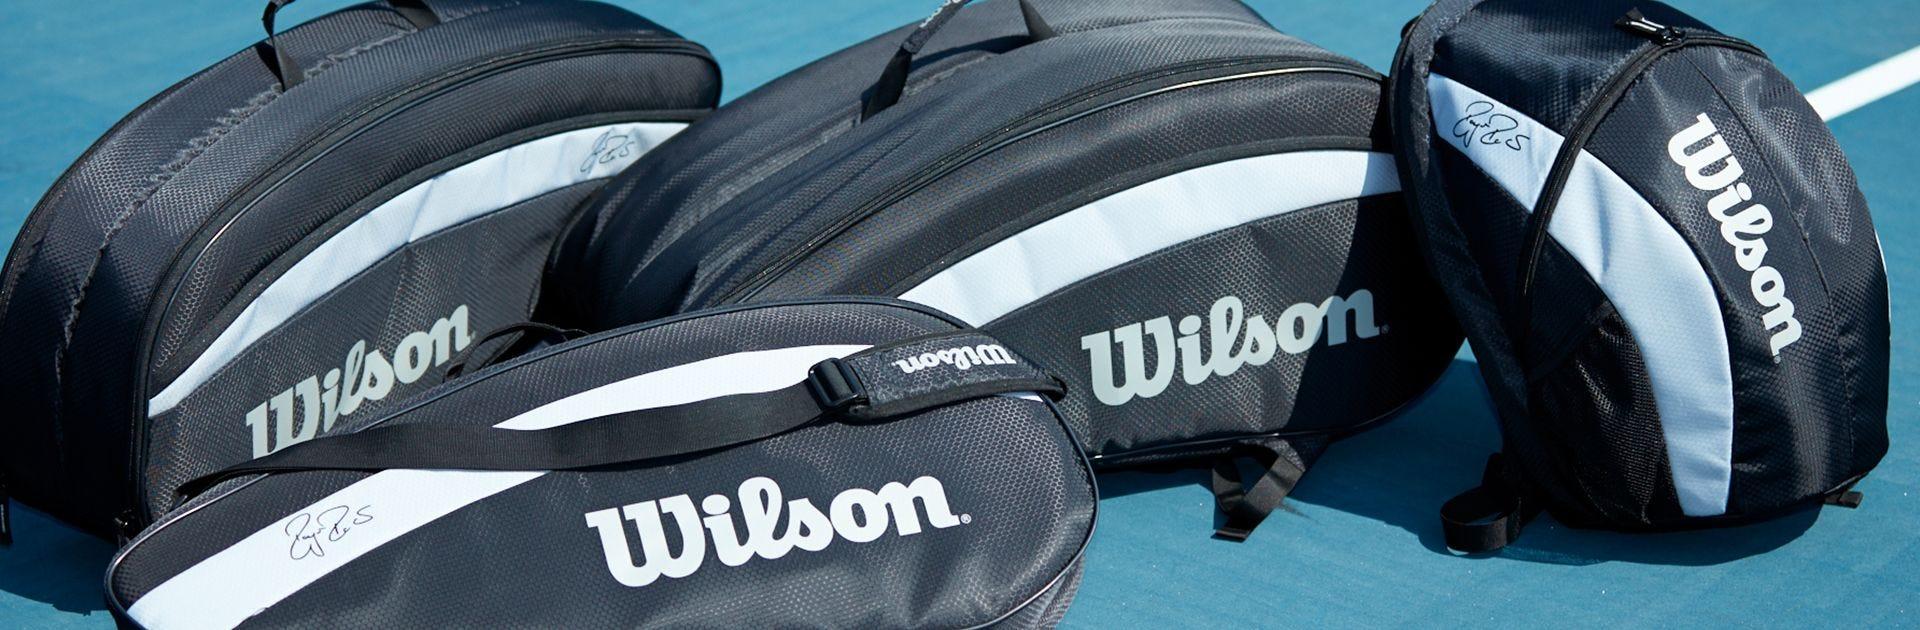 Recreation Bag Range laid on Tennis Court